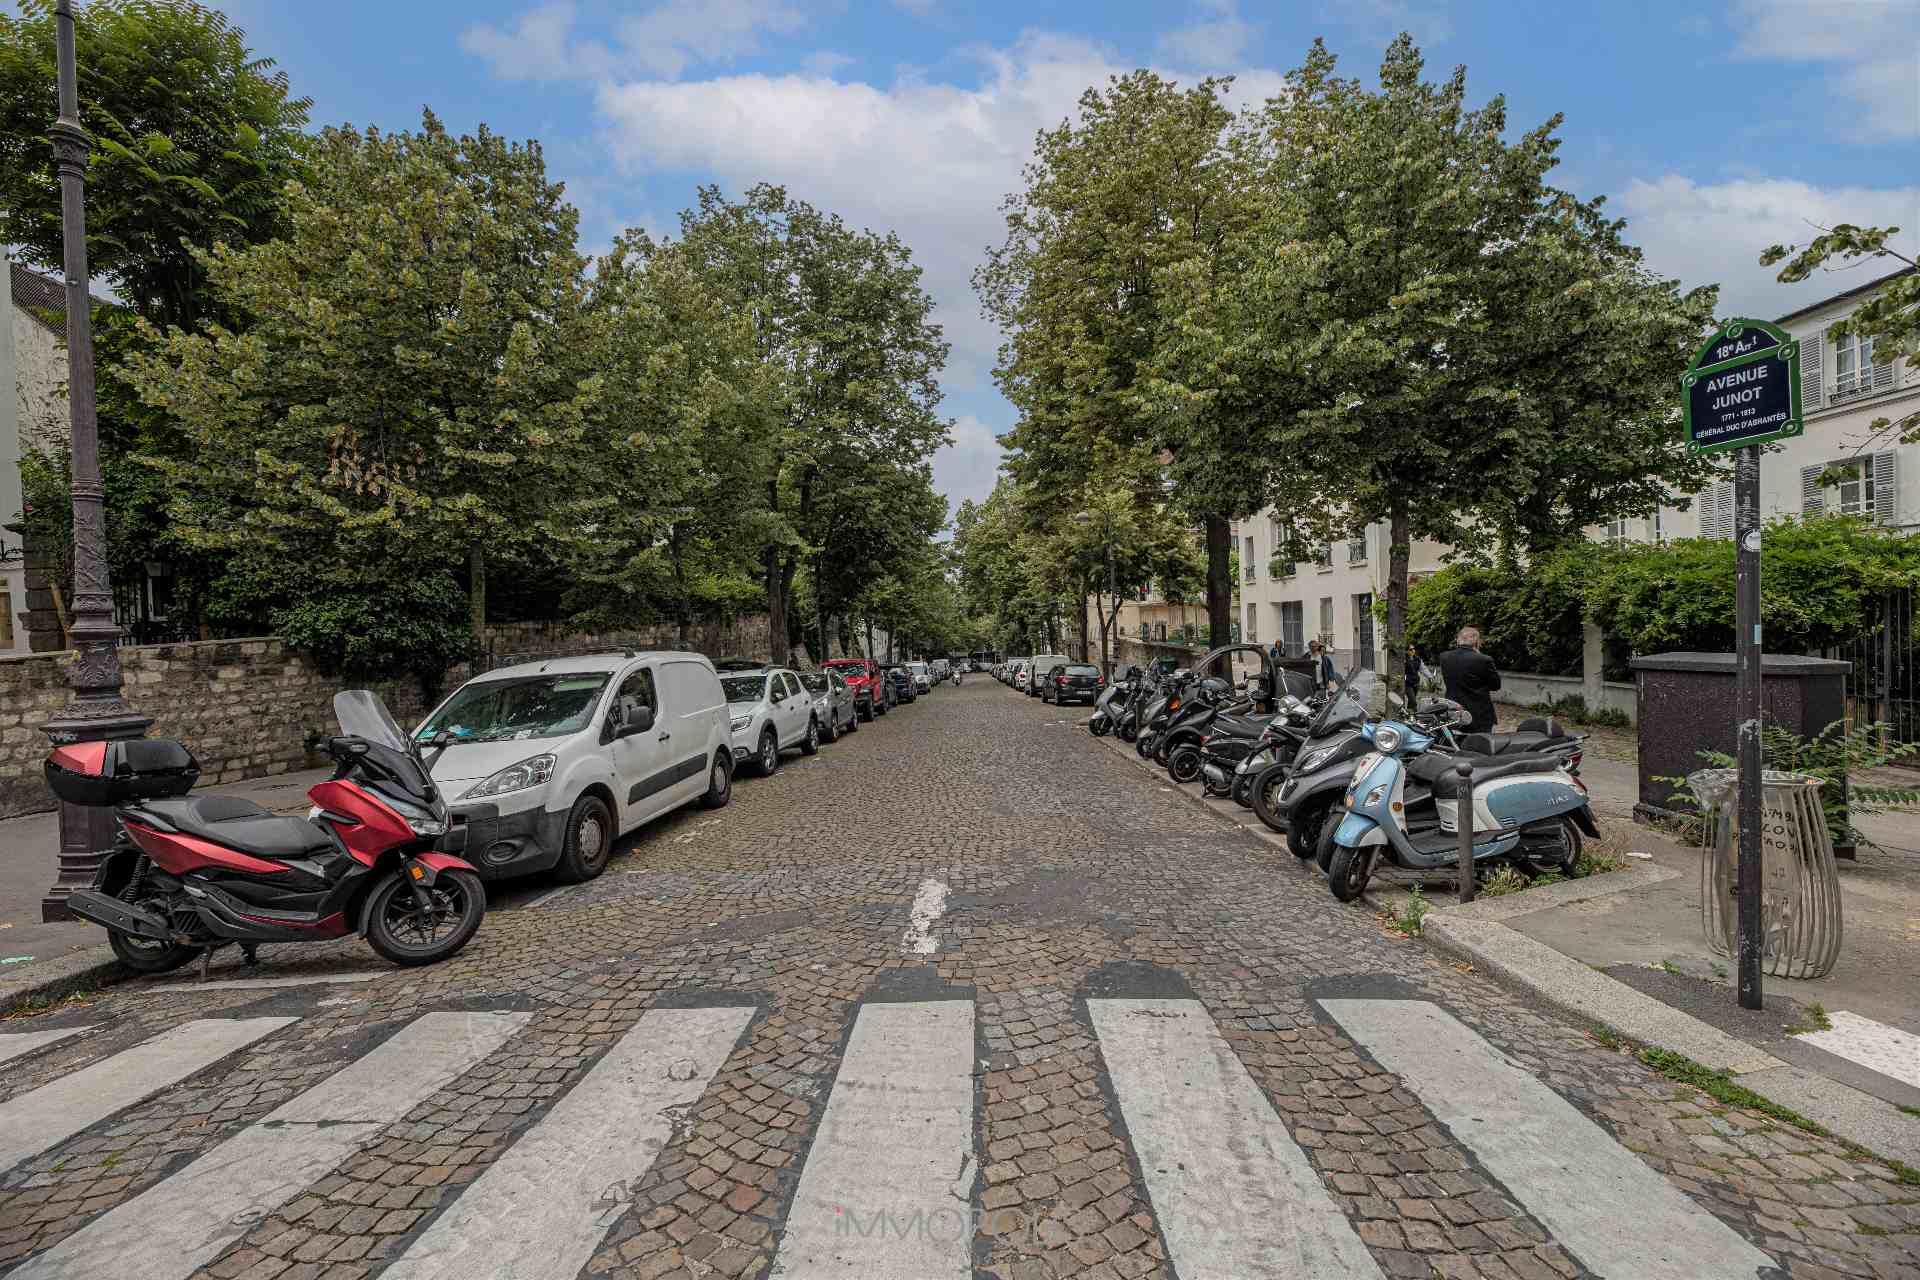 Avenue Junot en plein coeur de Montmartre. 9